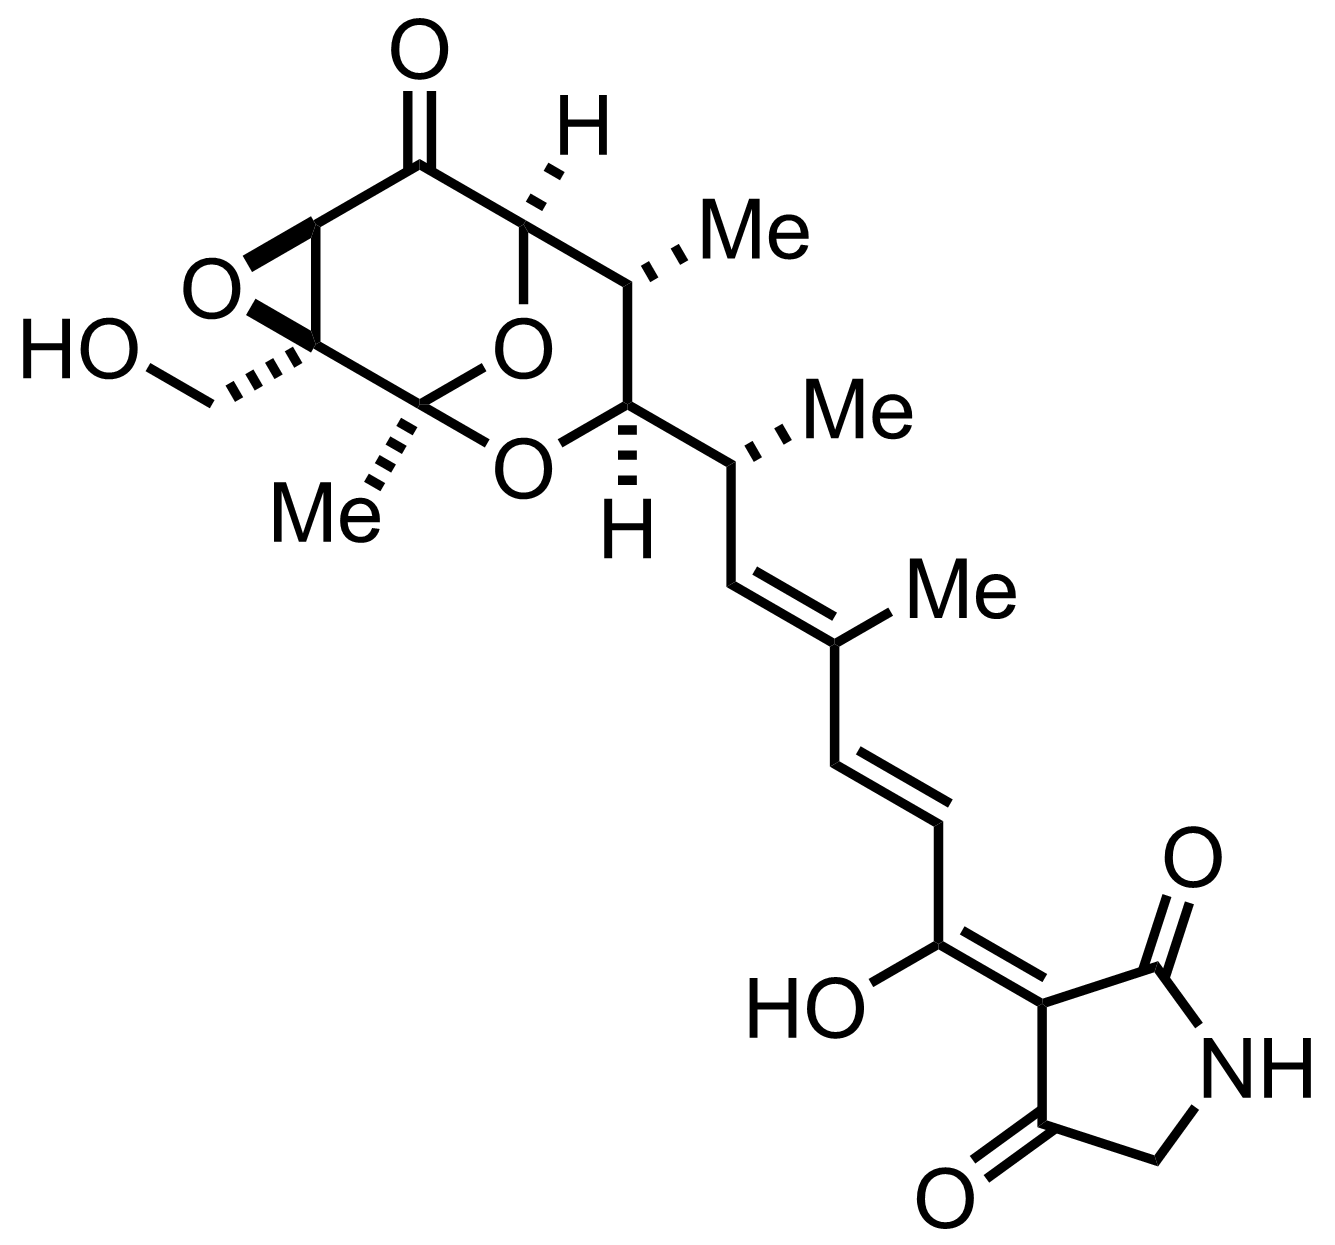 Structure of Tirandamycin B